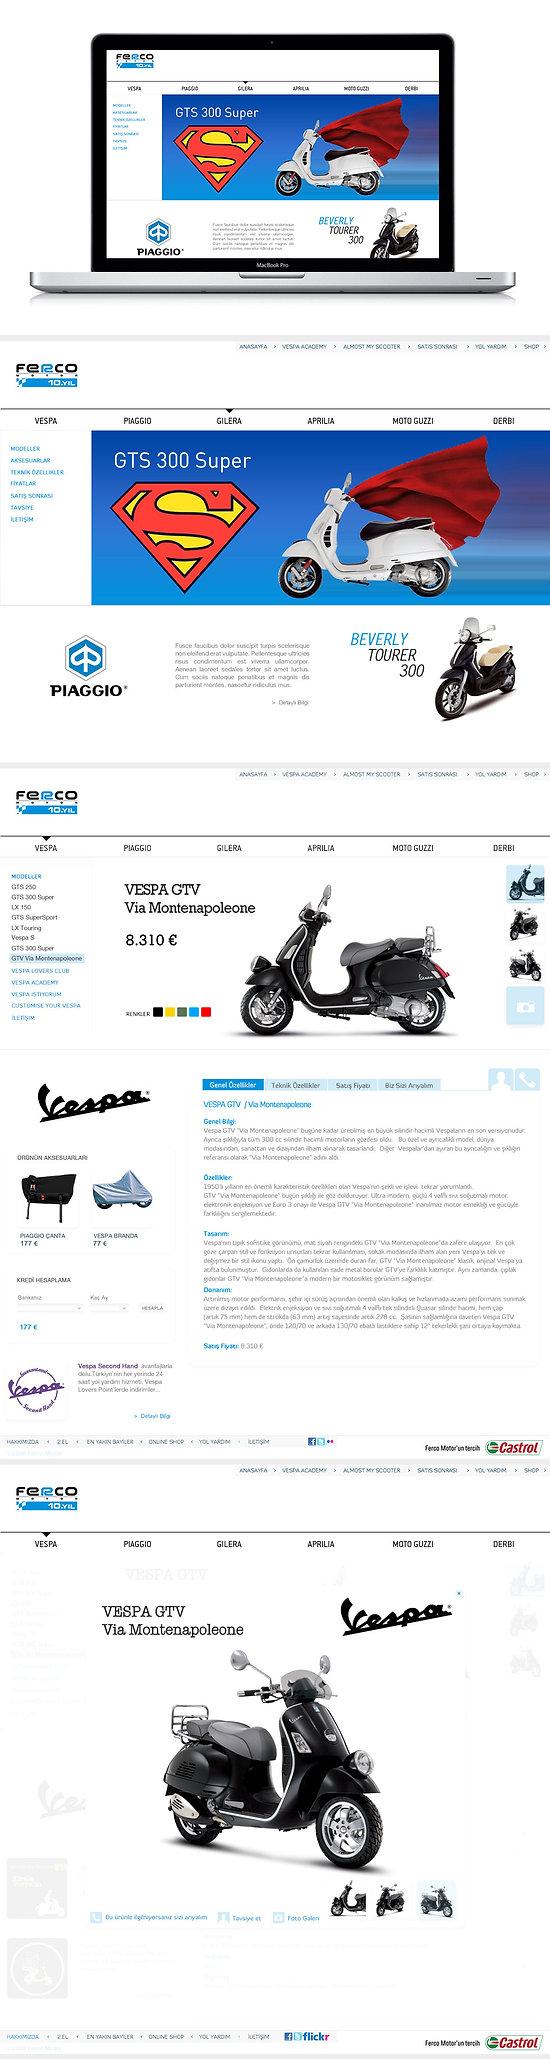 Ferco_Website.jpg